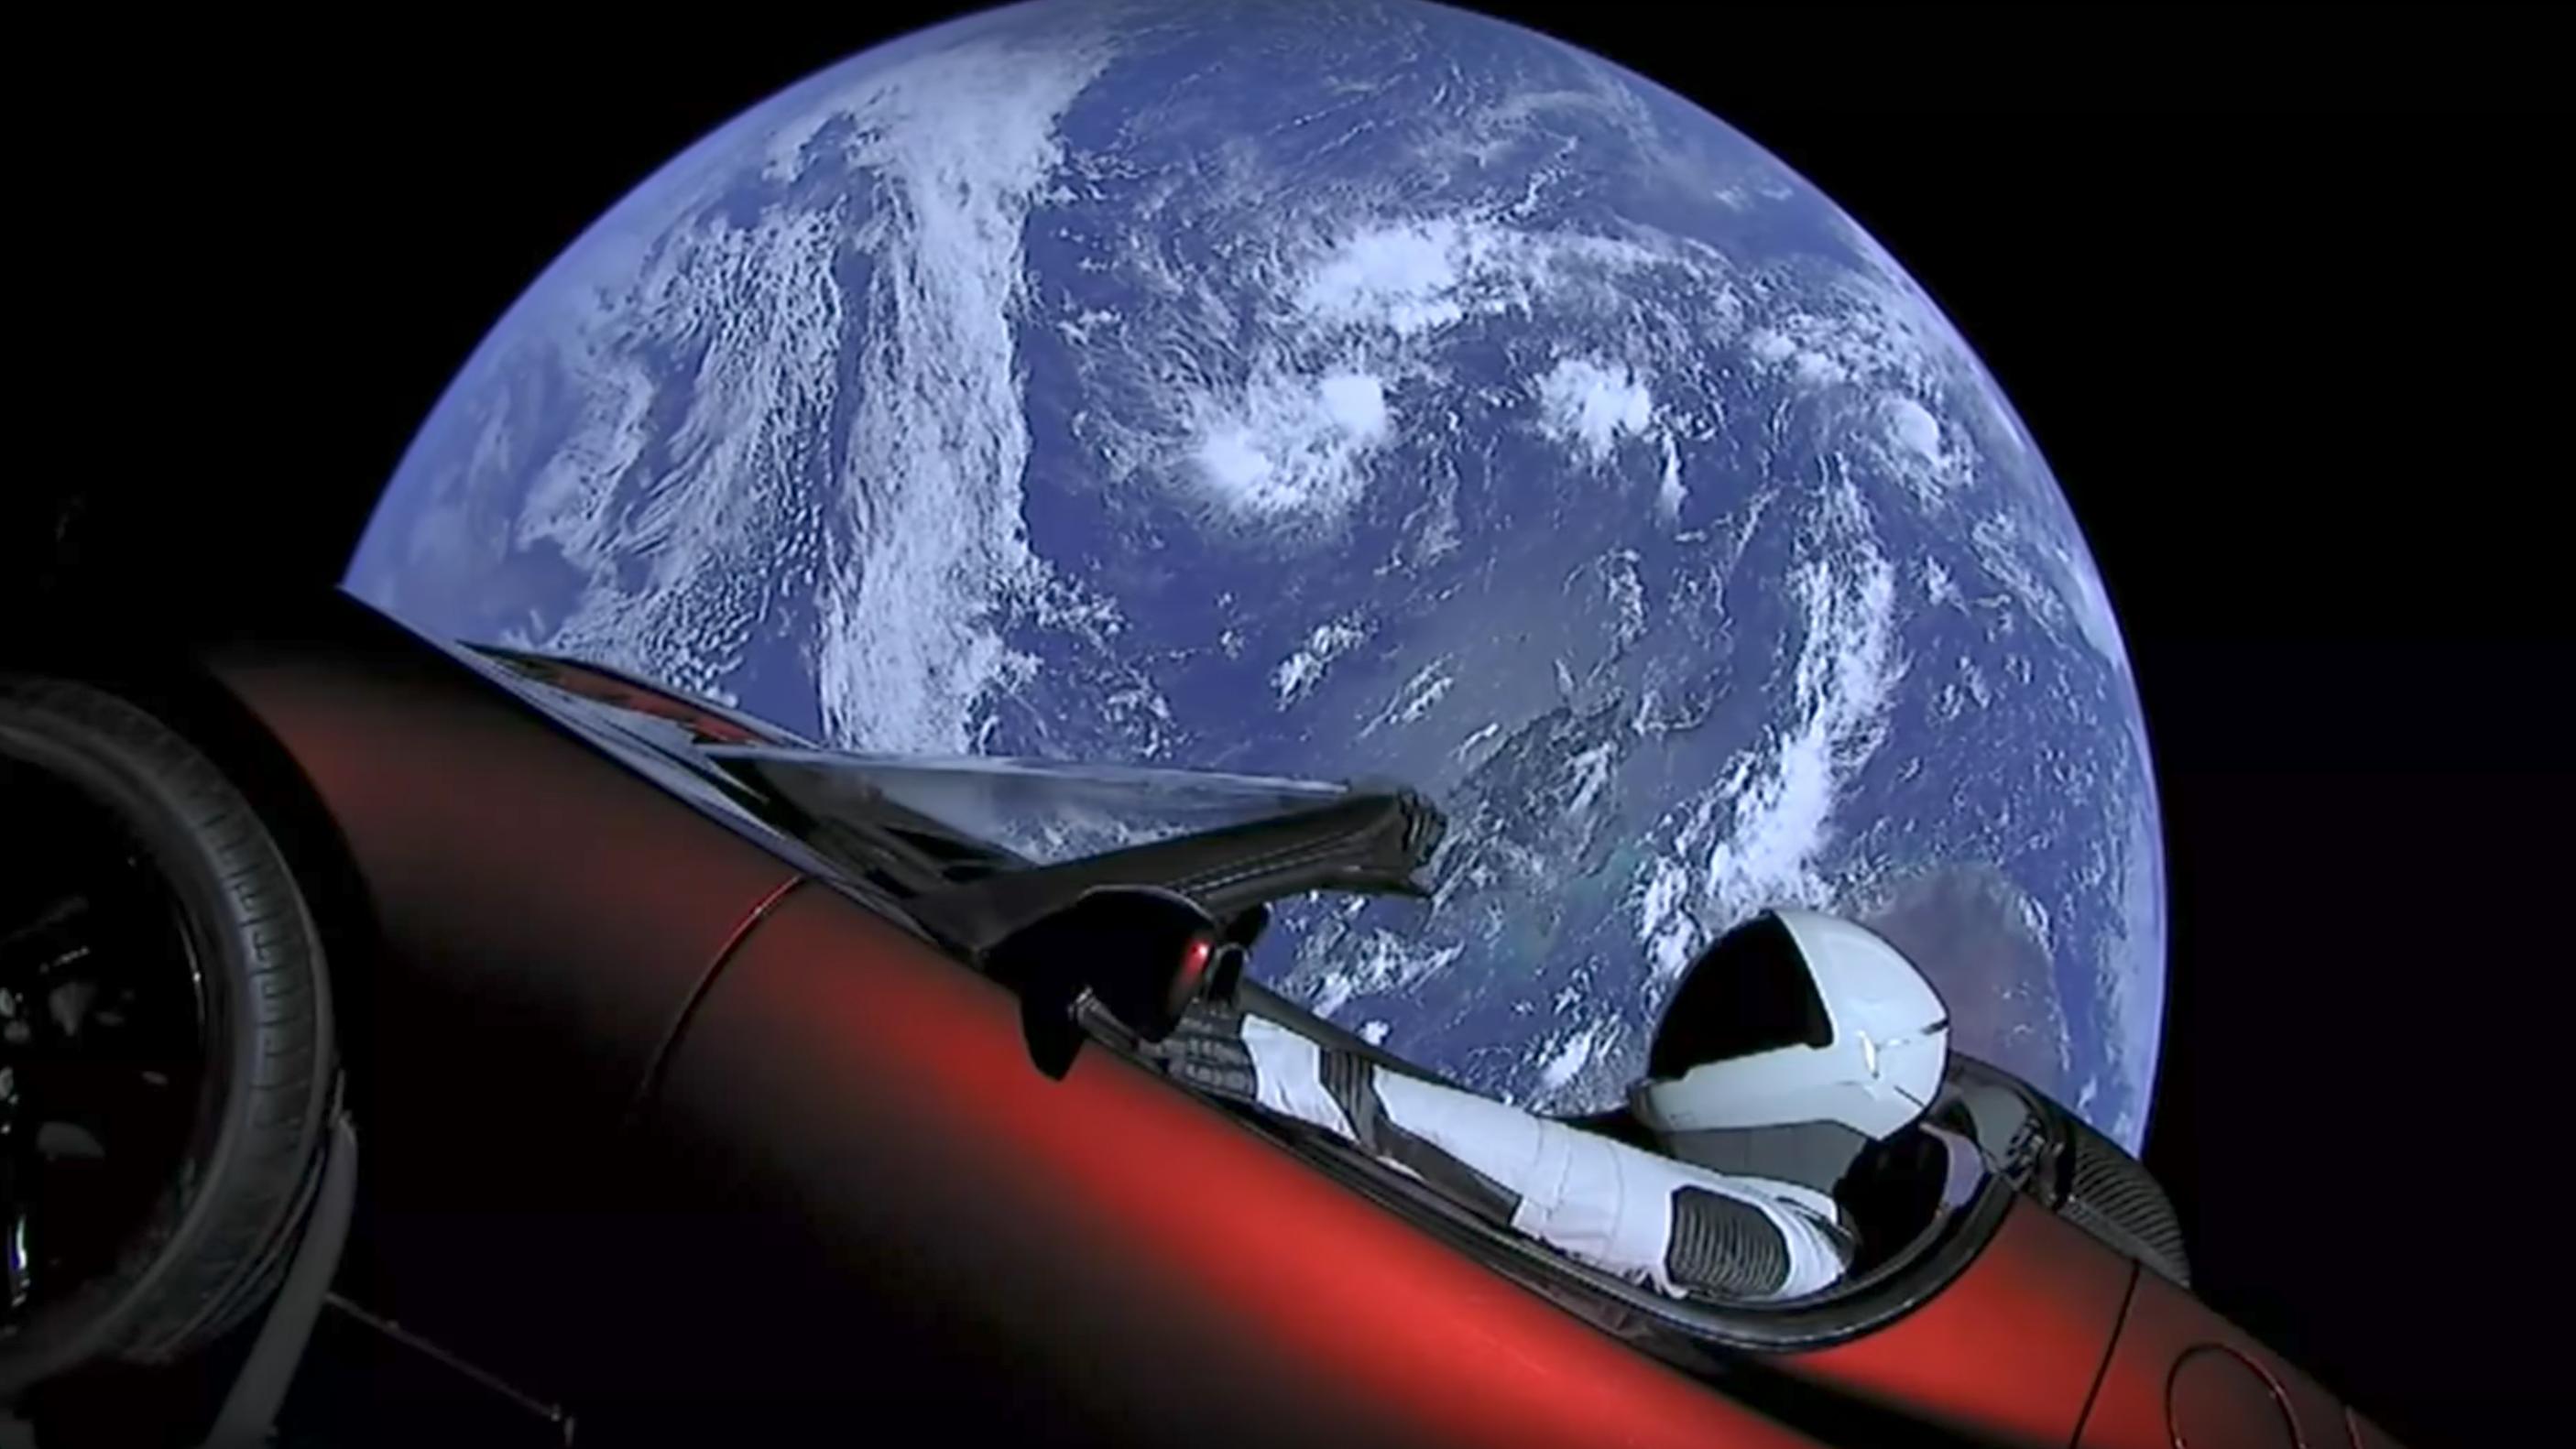 Elon Musk just sent his Tesla Roadster into space | Top Gear